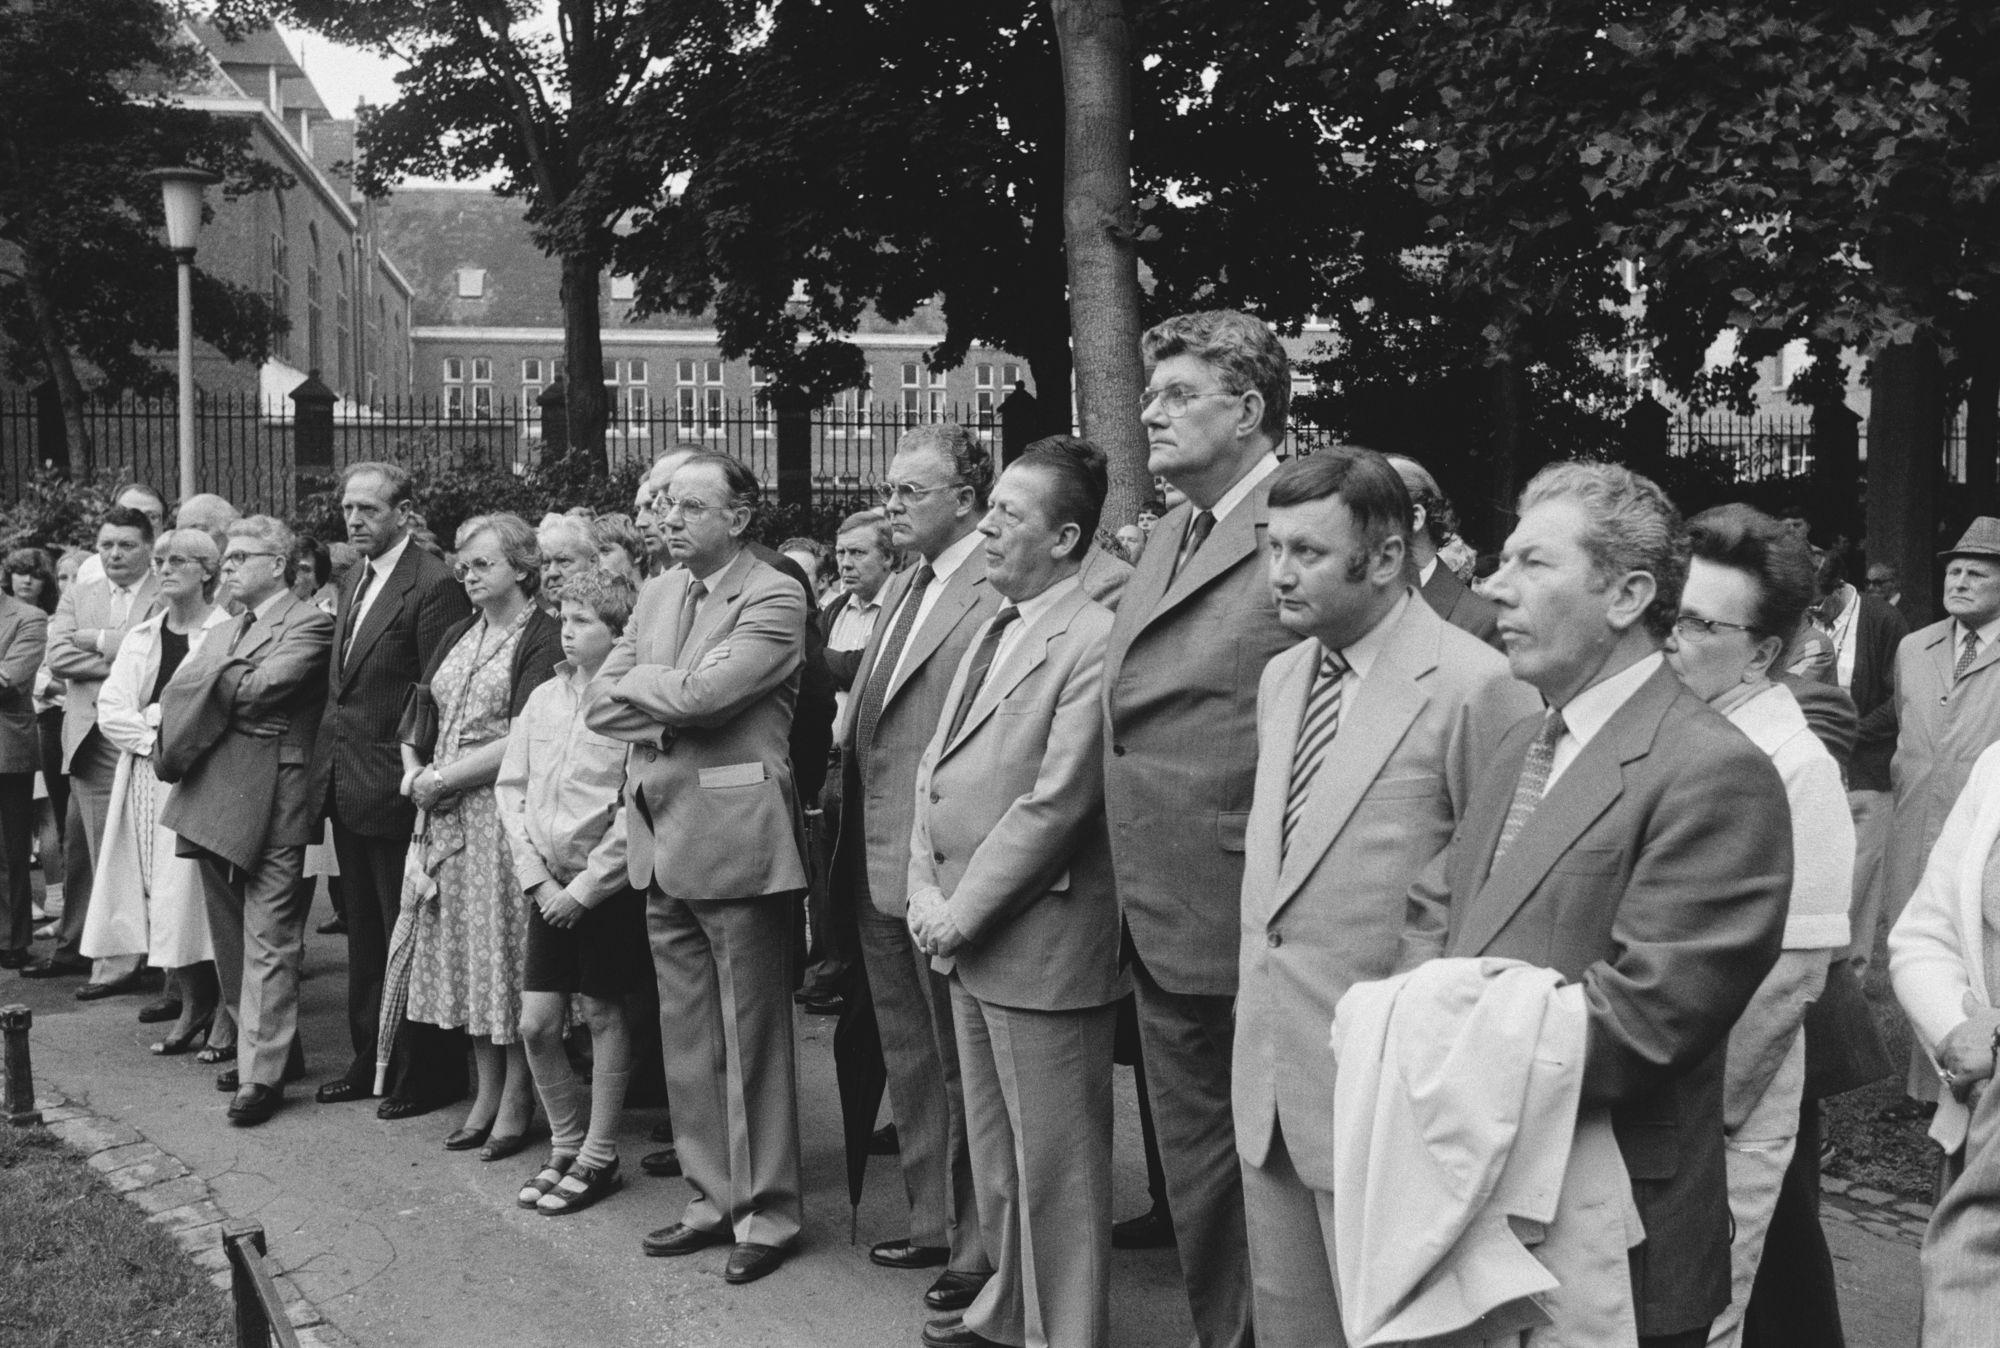 11 juliviering 1981